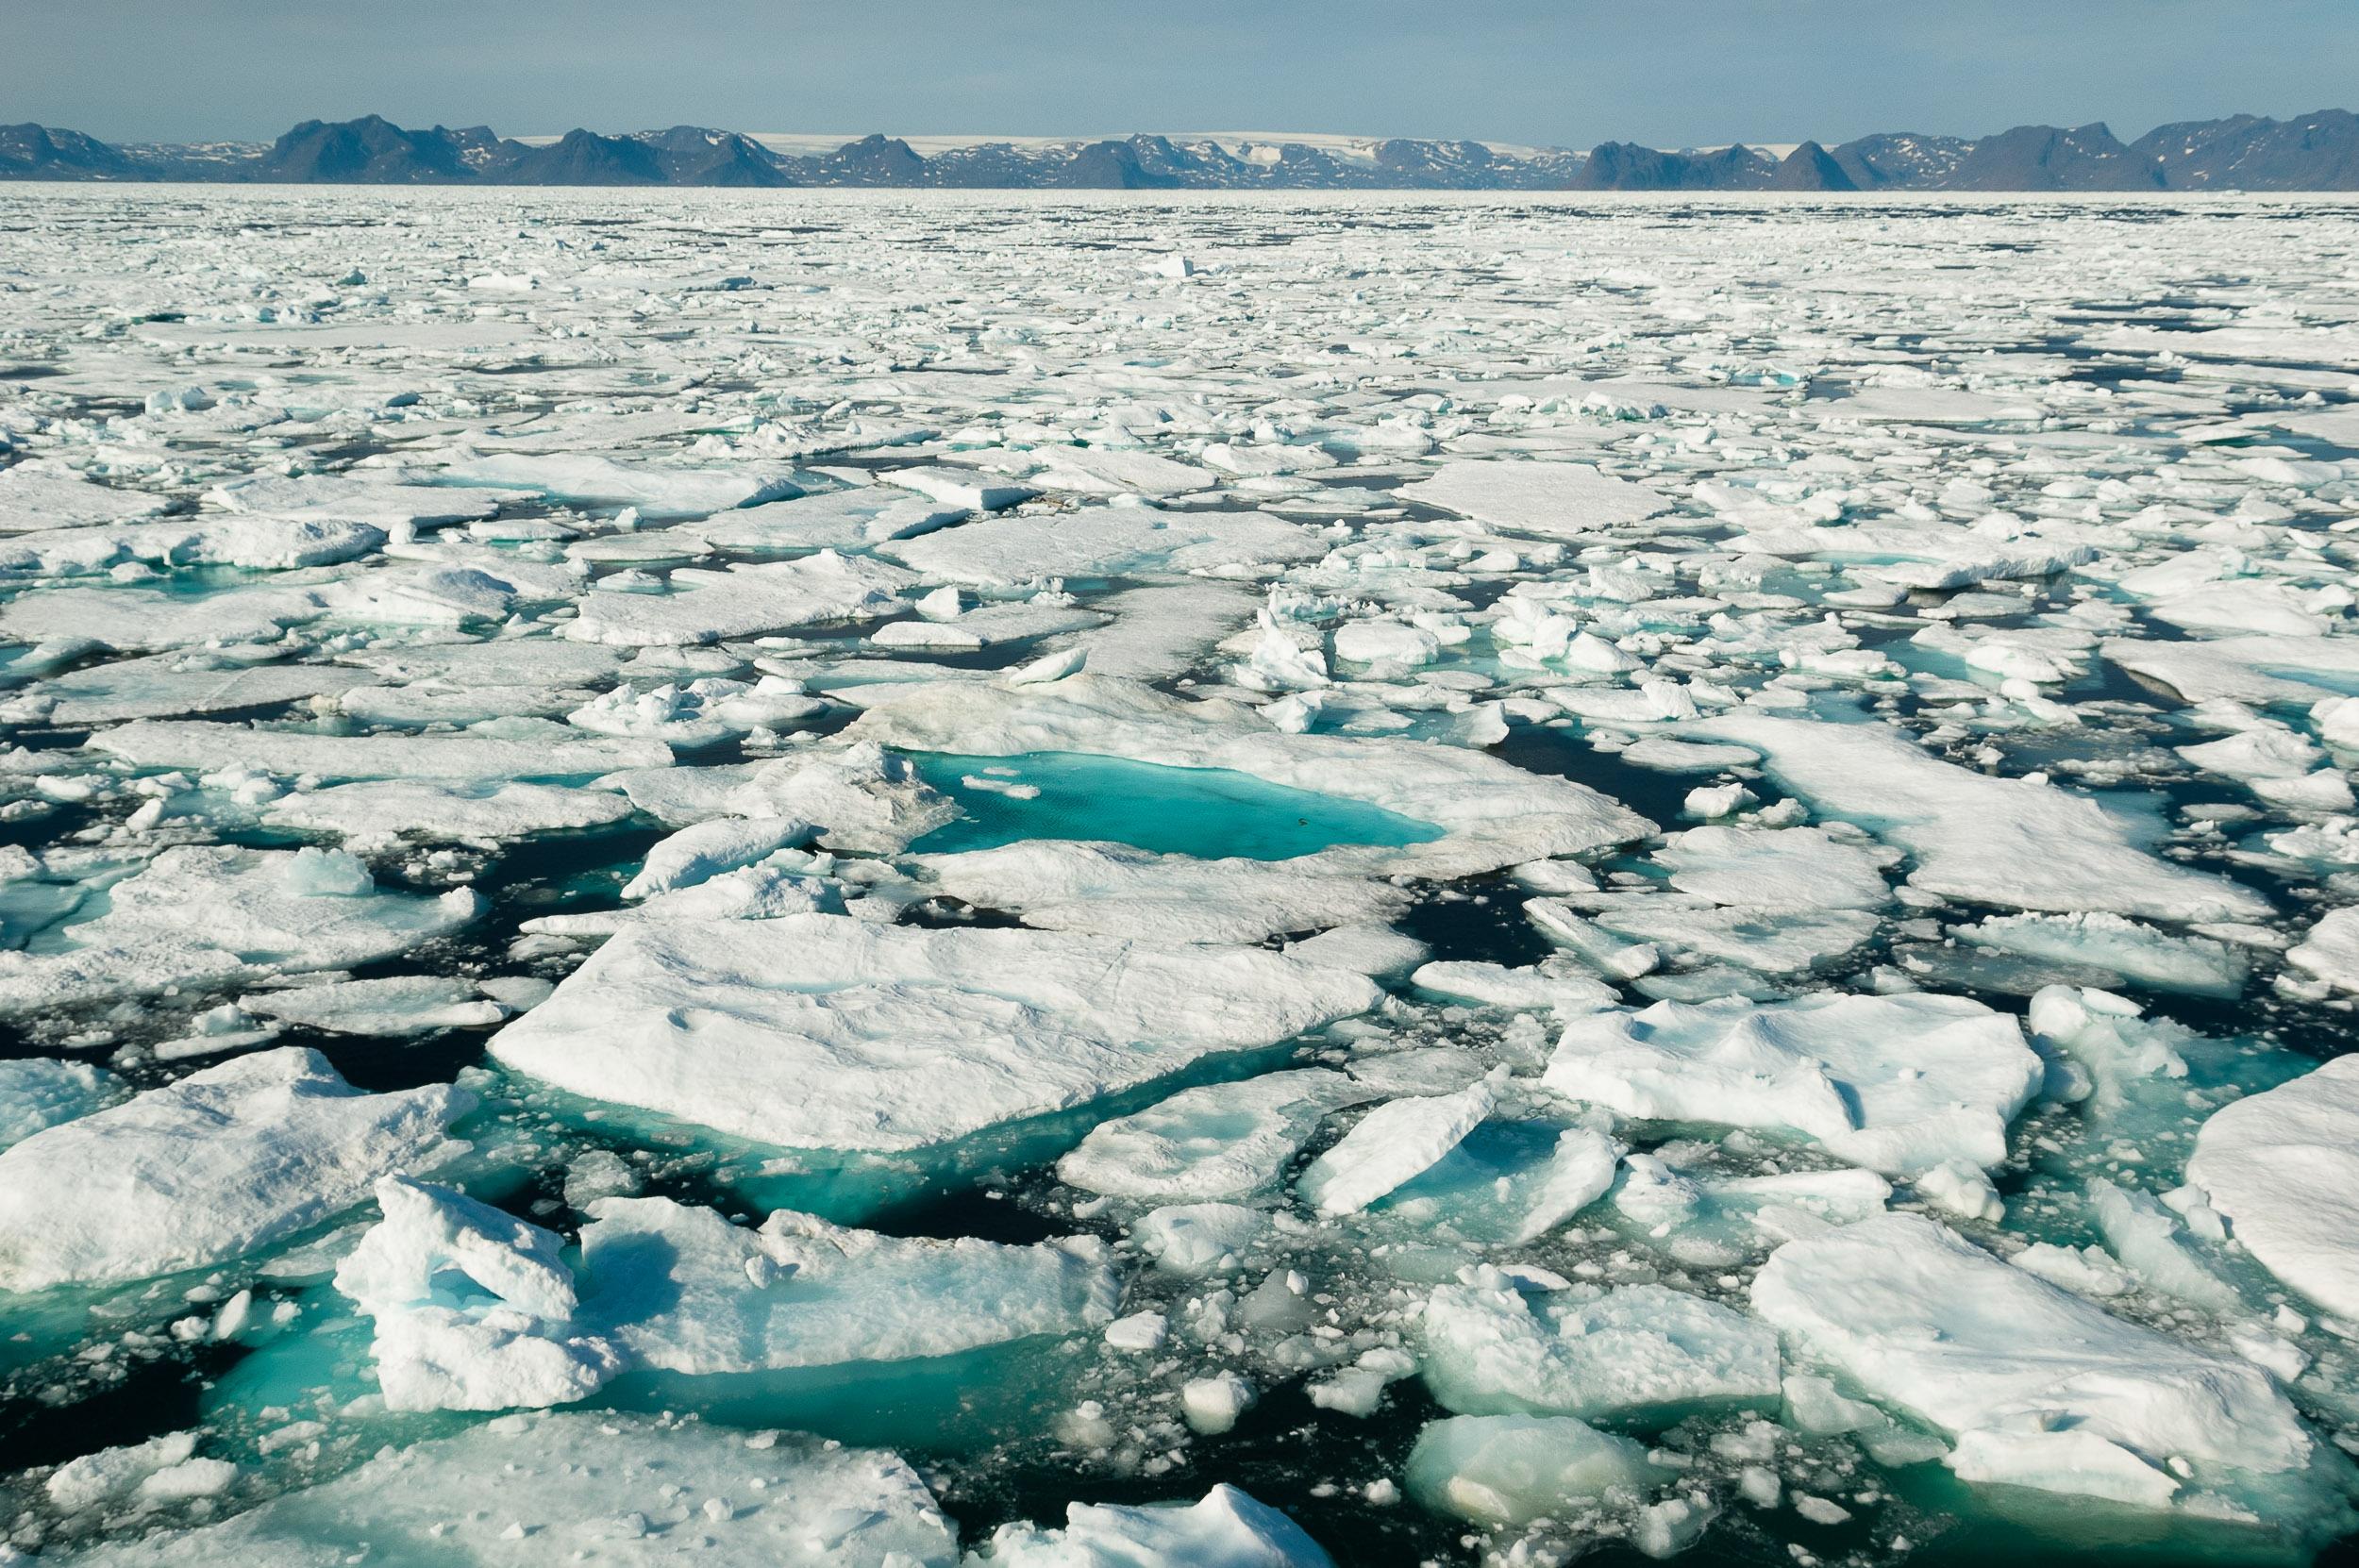 Heavy pack ice near Baffin Island, Canada.